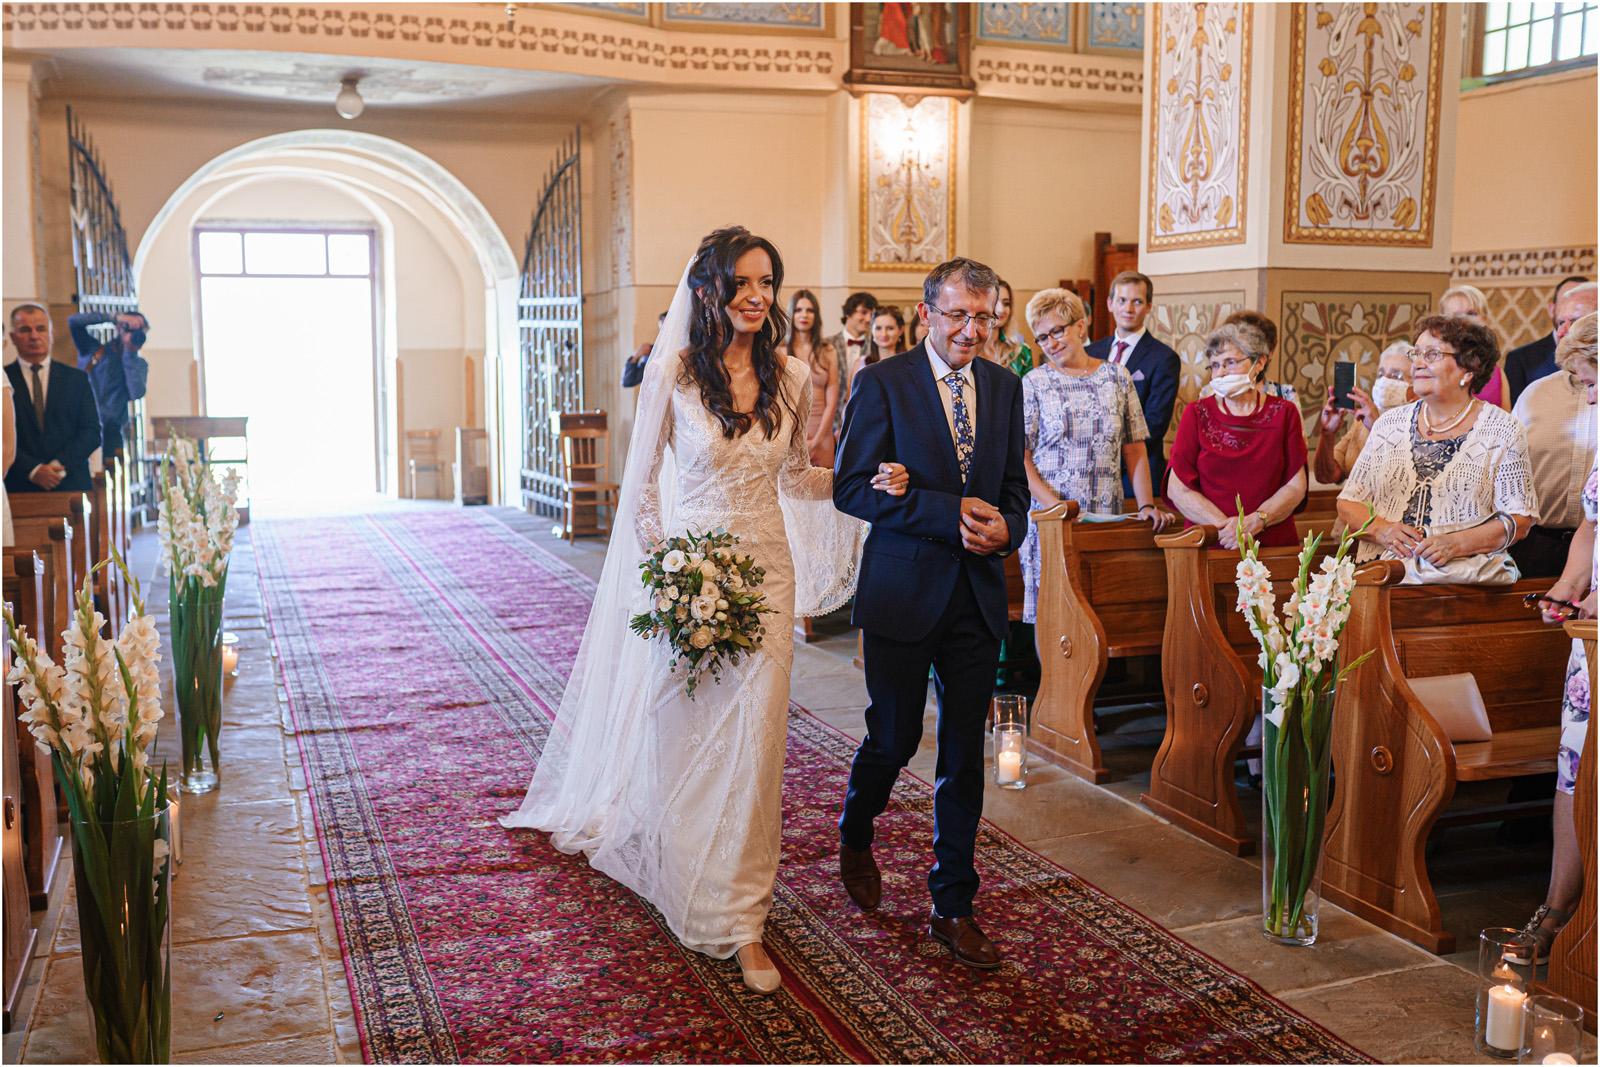 Ania & Mateusz | boho wesele w Stodole pod Kasztanami 39